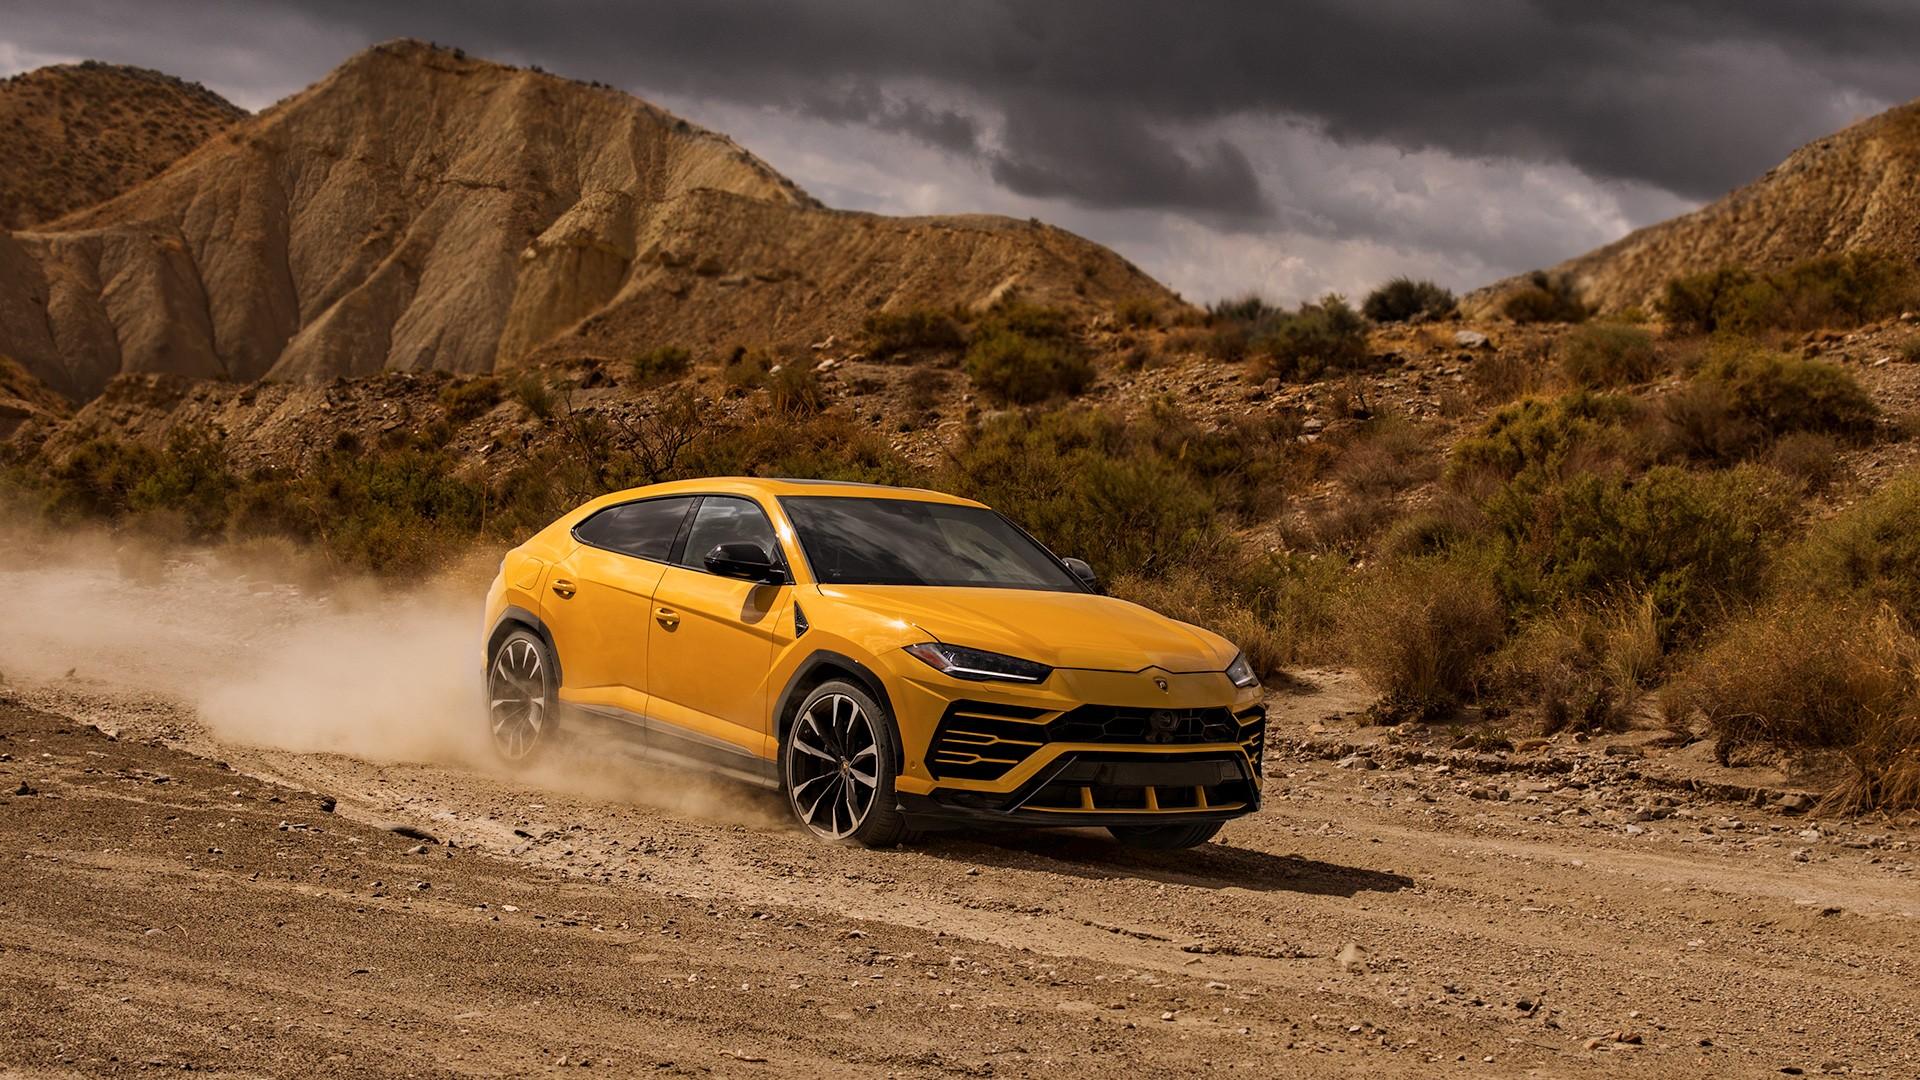 В РФ практически раскуплен годовой тираж Lamborghini Urus